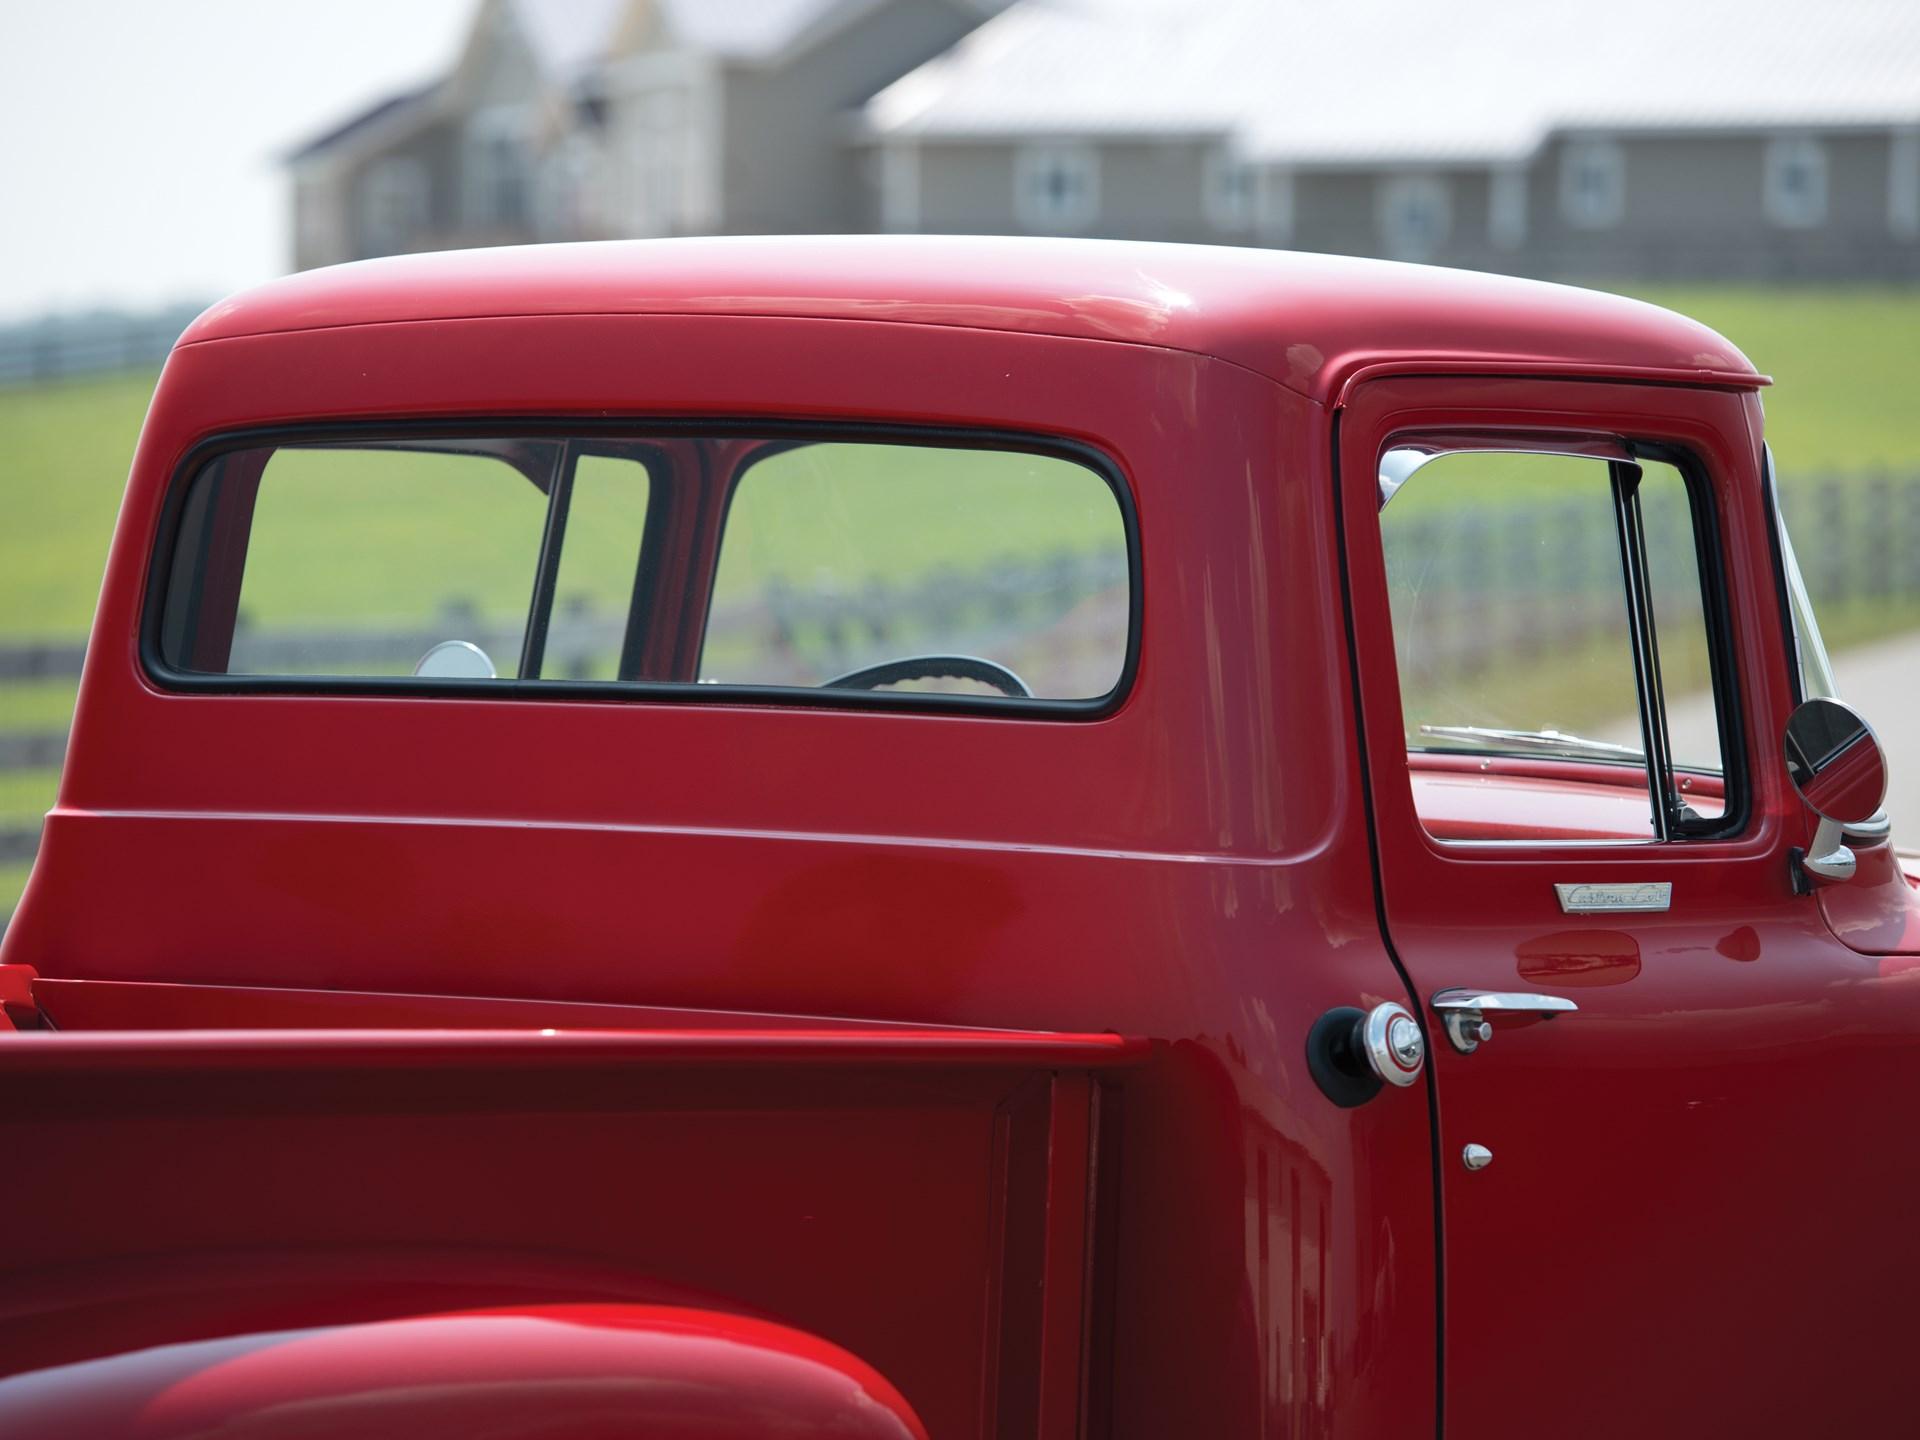 Rm Sothebys 1956 Ford F 100 Pickup Hershey 2014 1955 F100 Sun Visor